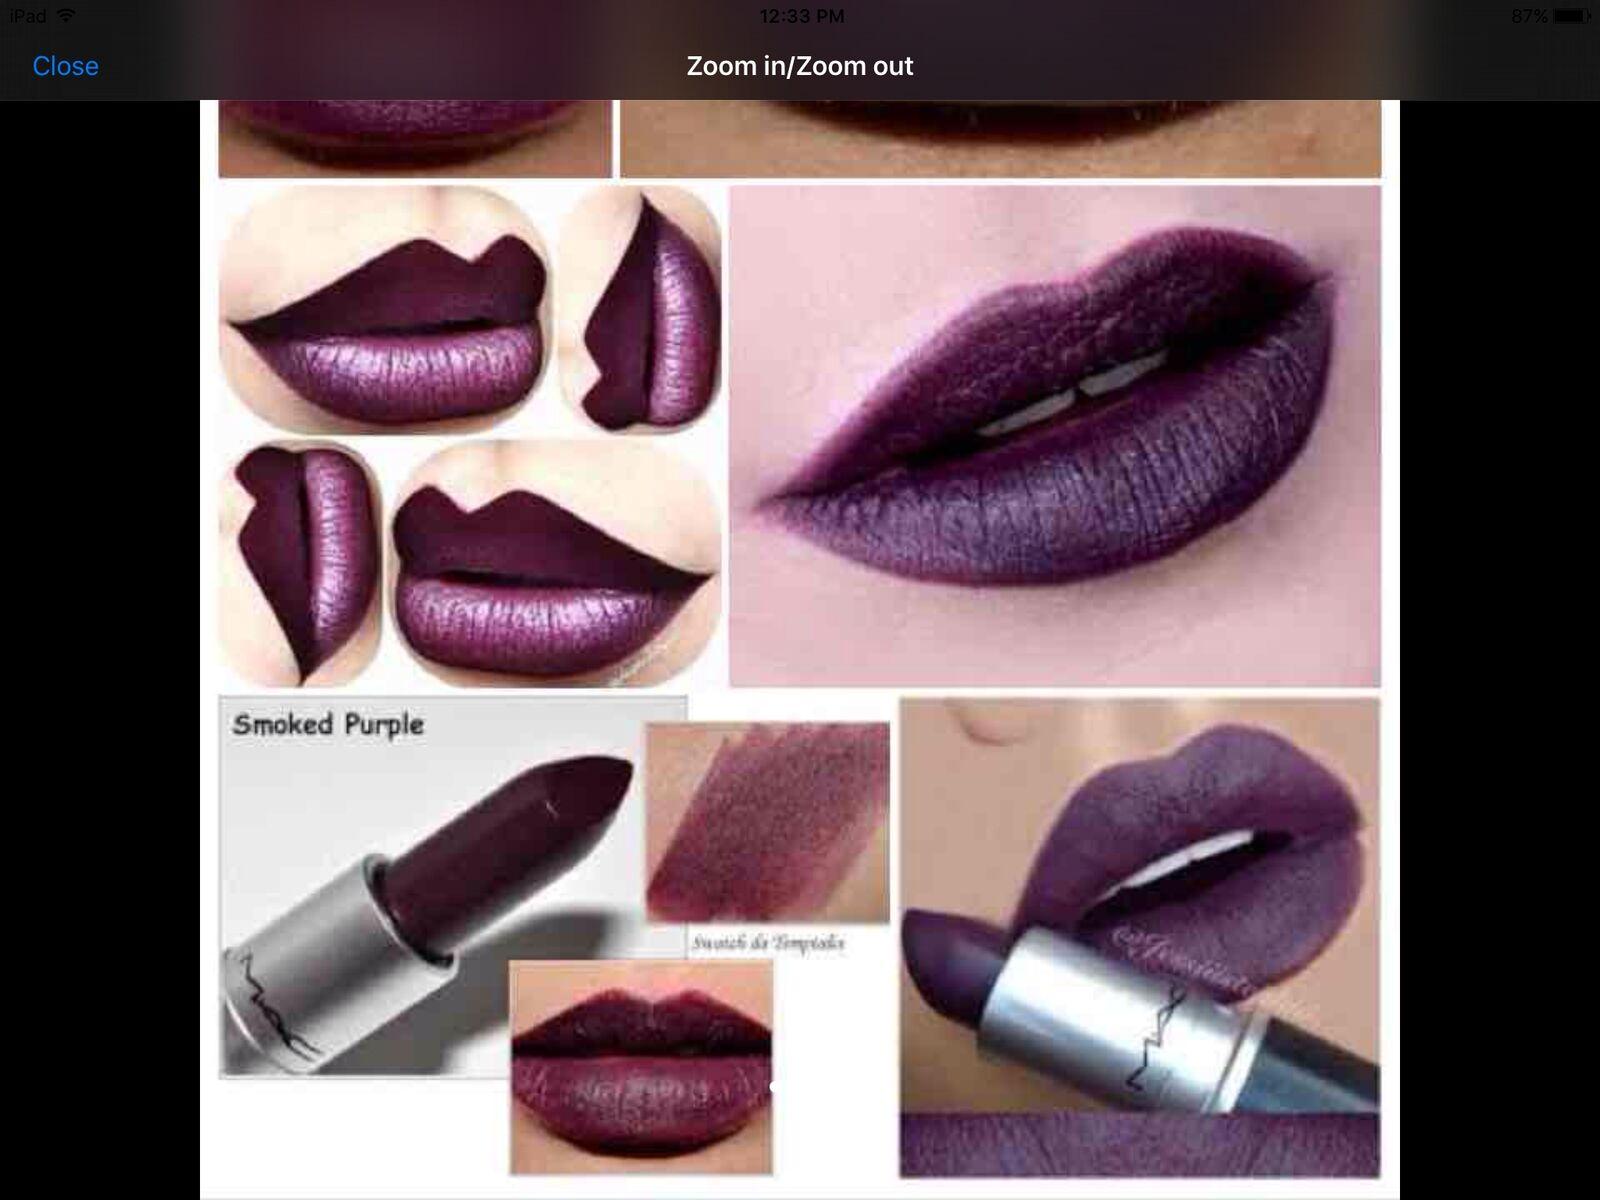 Connu Mac Matte Lipstick Smoked Purple - 100 Authentic | eBay ZU51